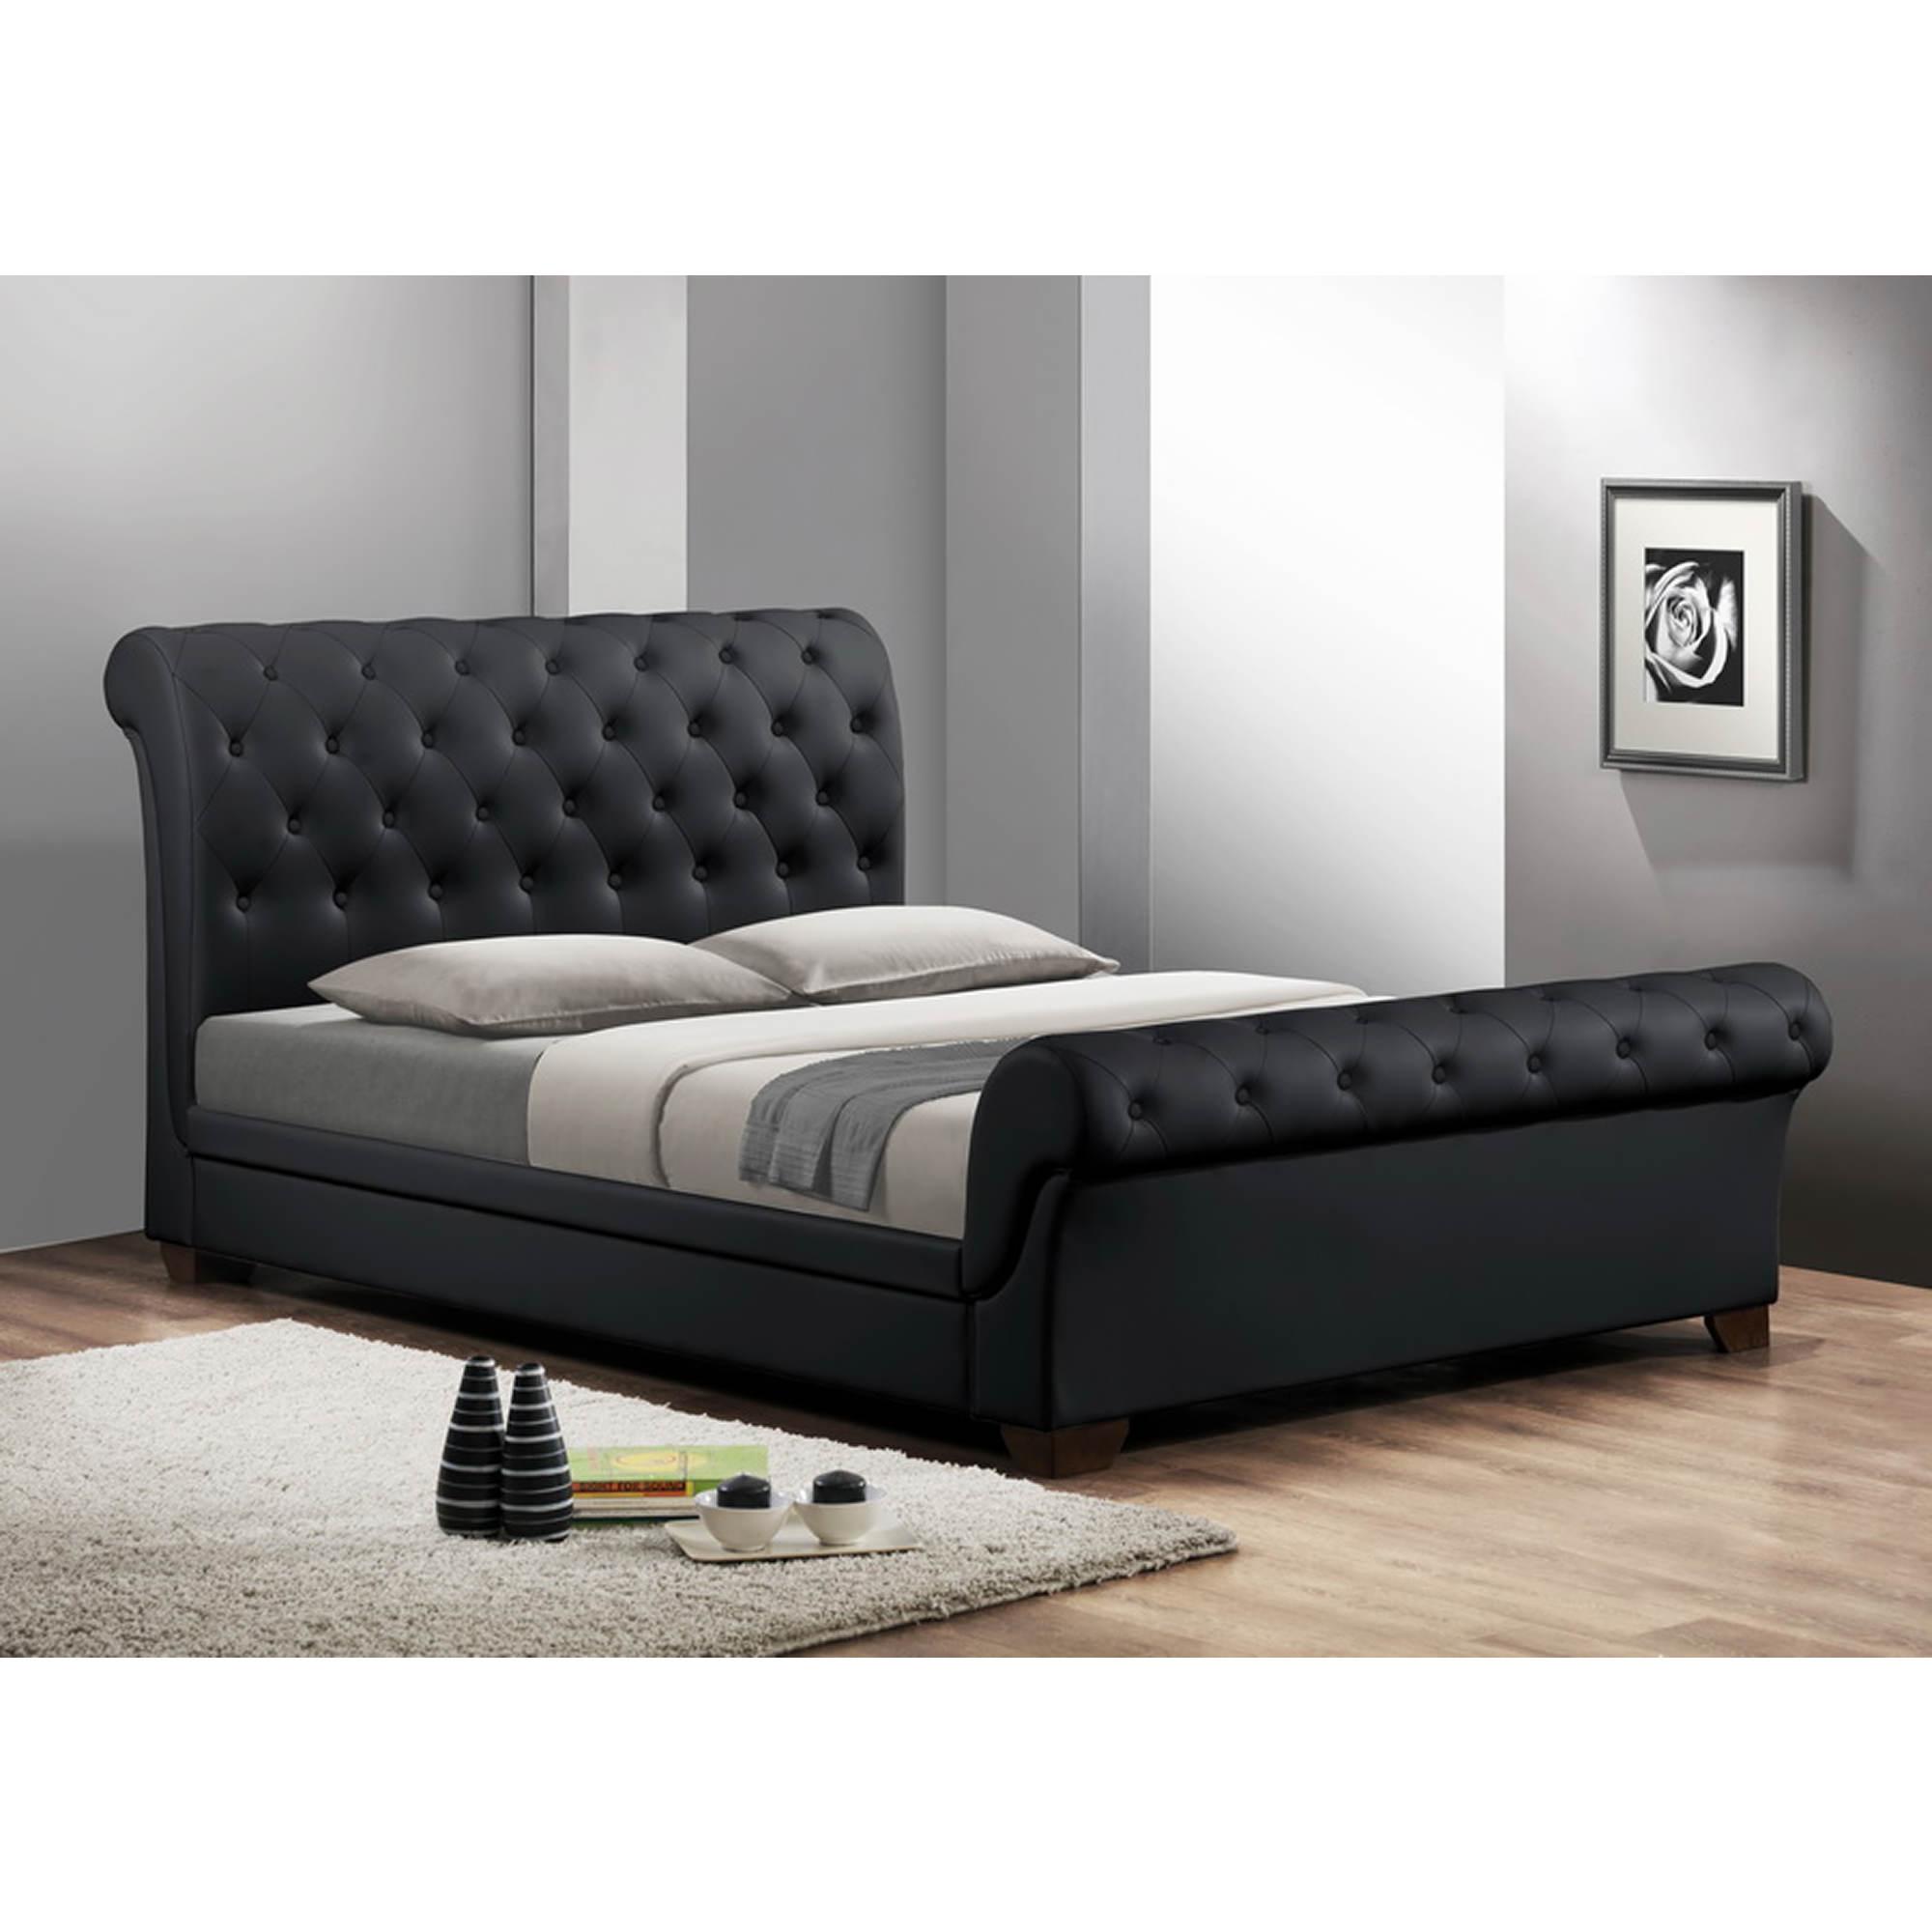 bedroom grant sleigh bed queen upholstered furniture